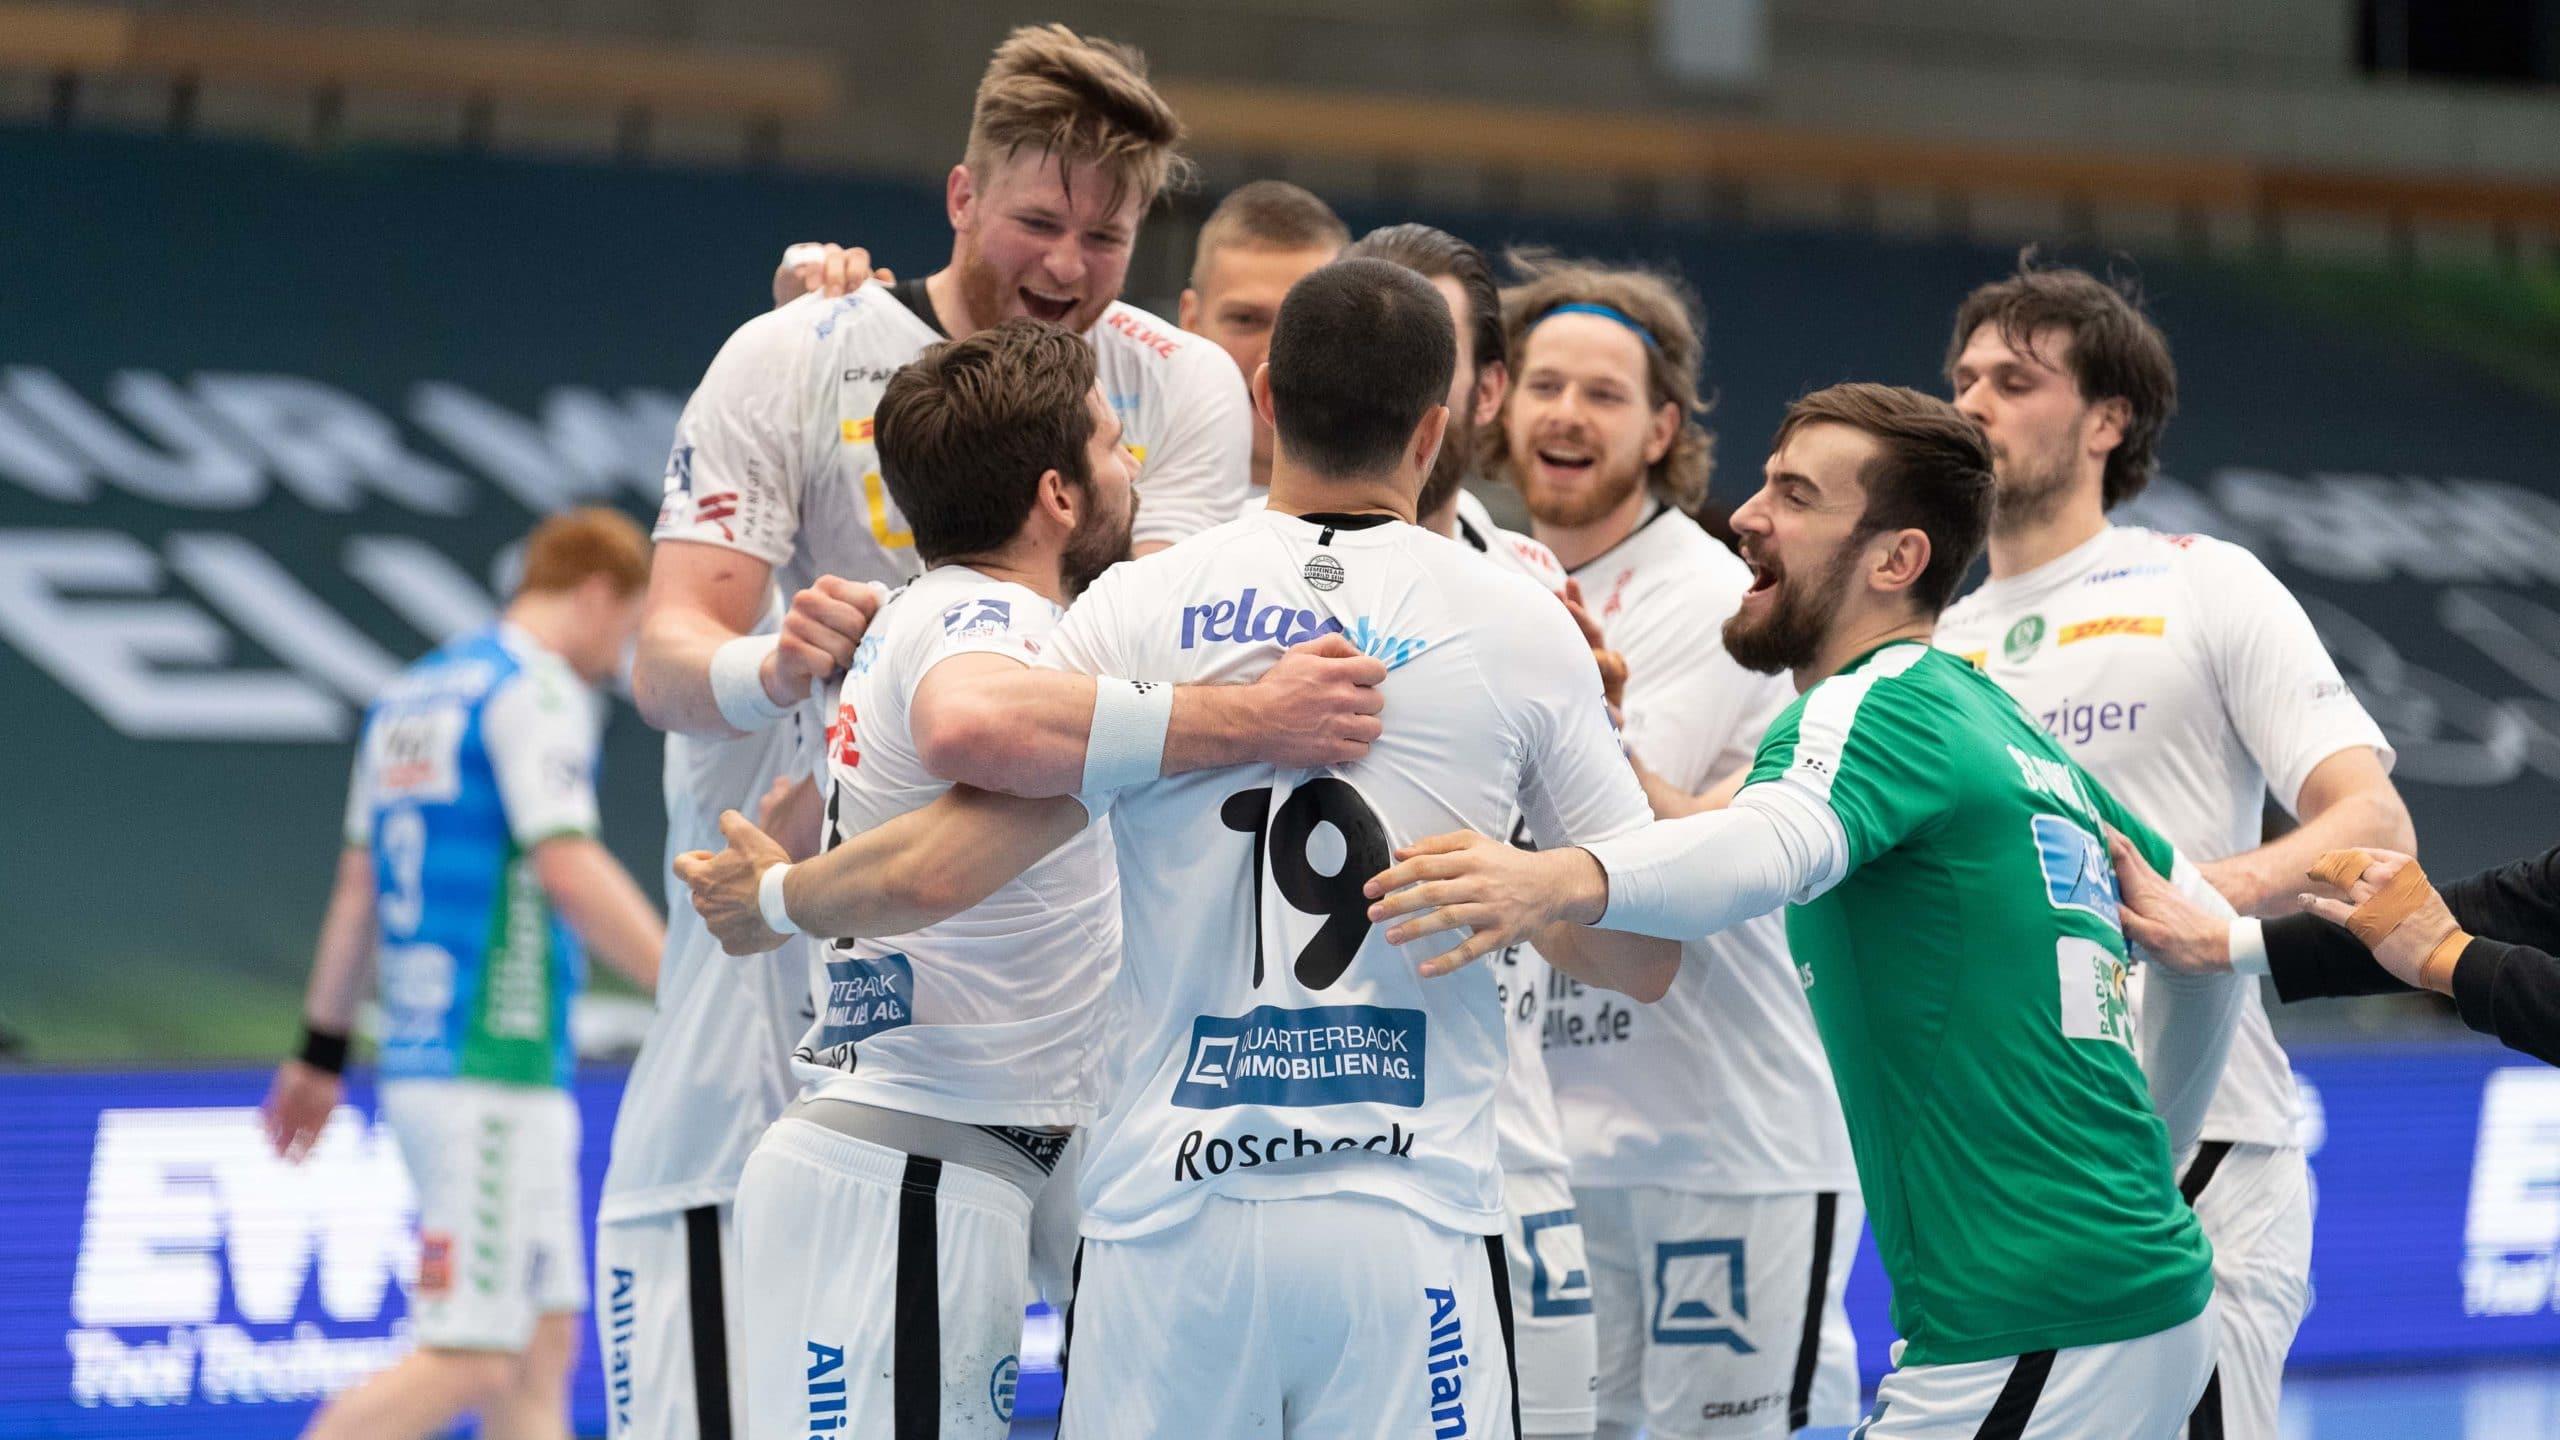 Dhfk Leipzig Handball Spielplan